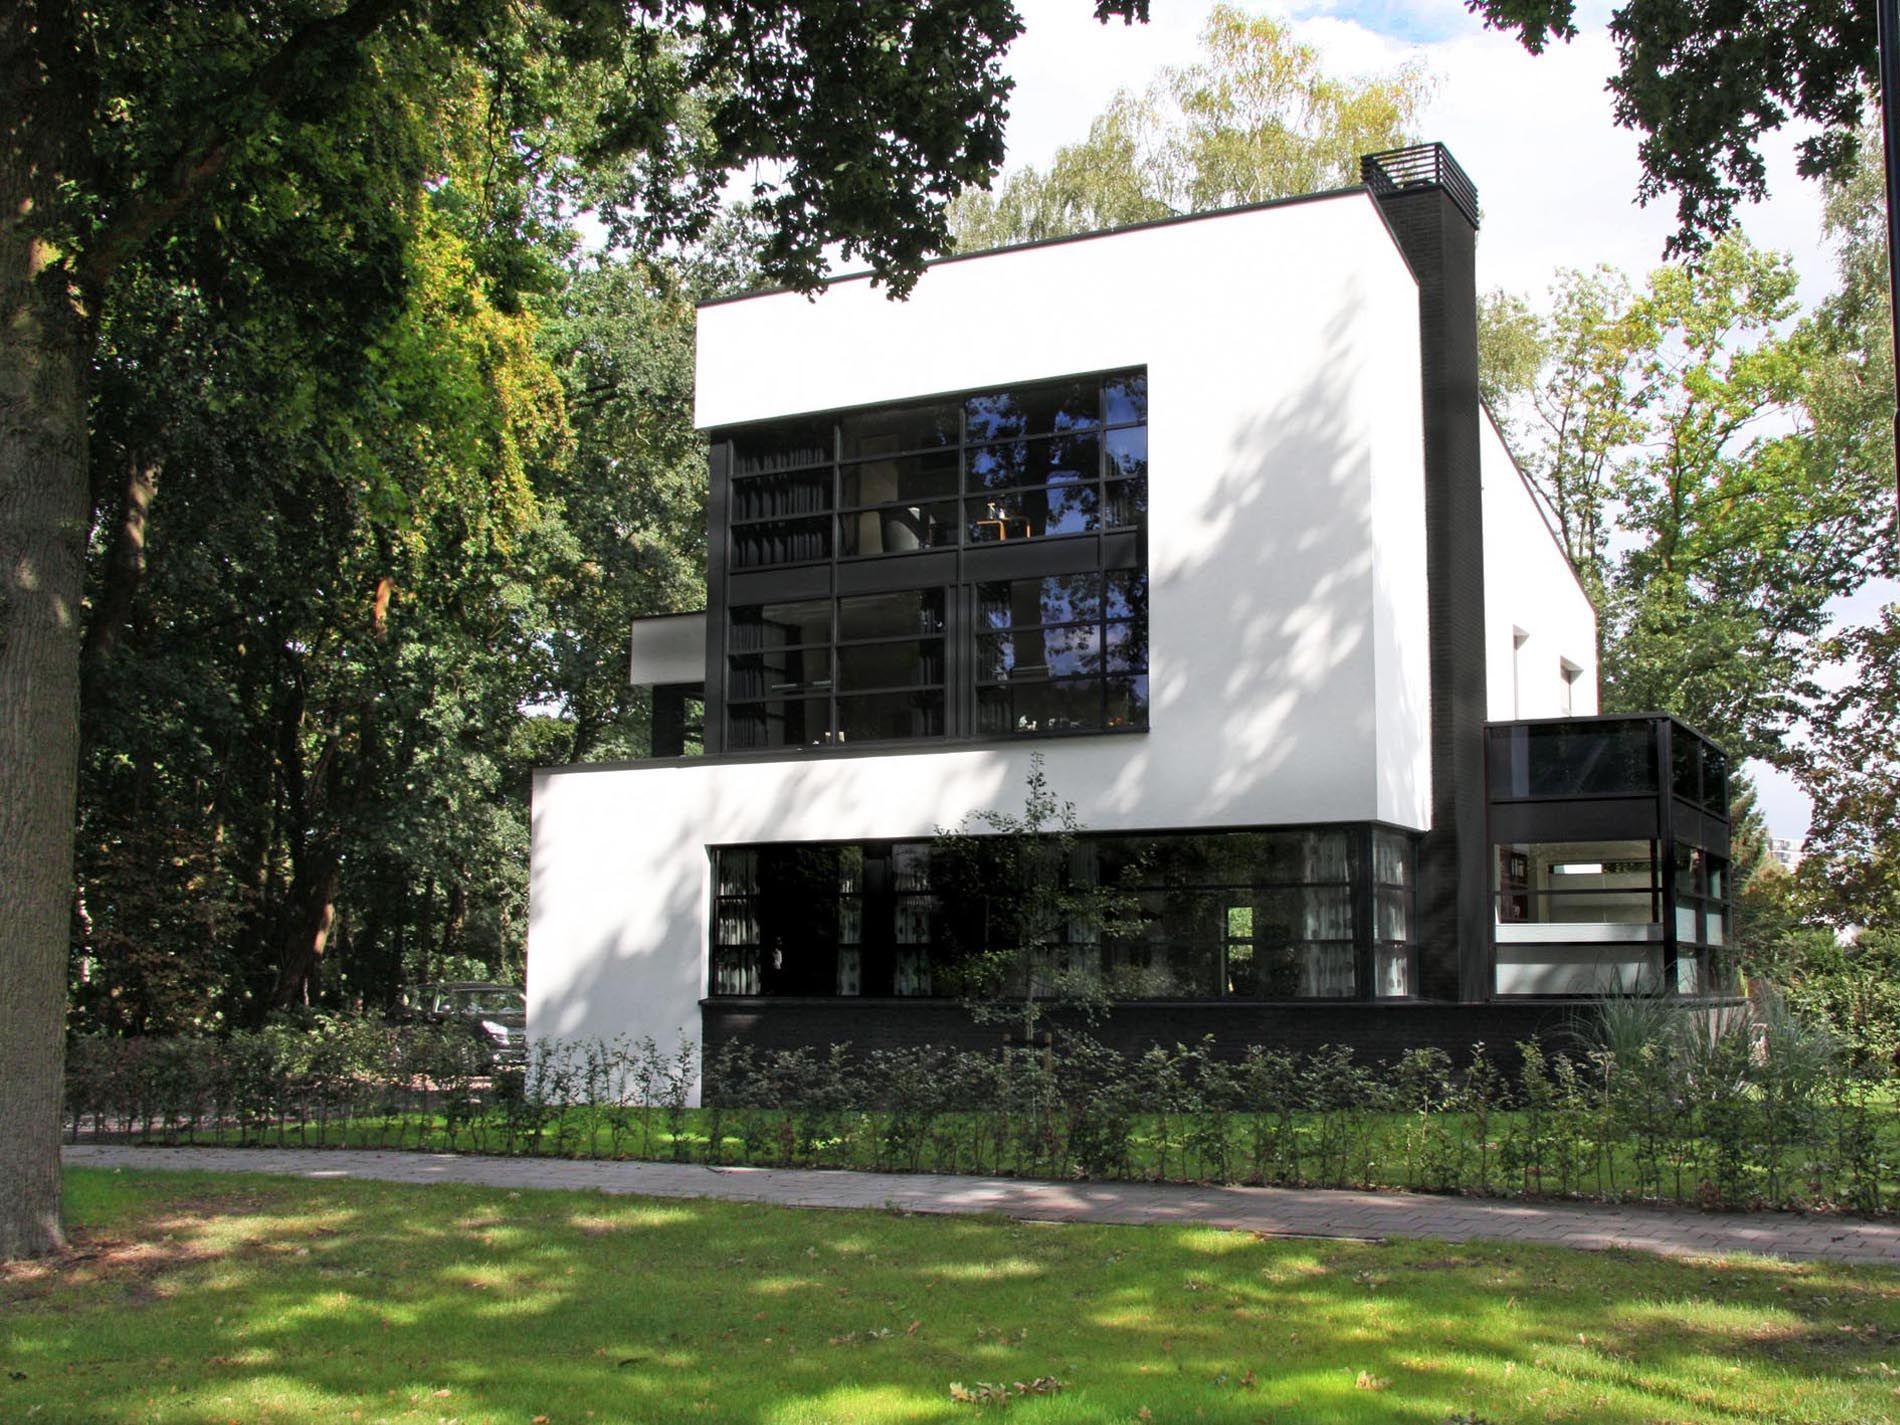 Maas architecten woonhuis apeldoorn stucwerk modern for Moderne villa architectuur